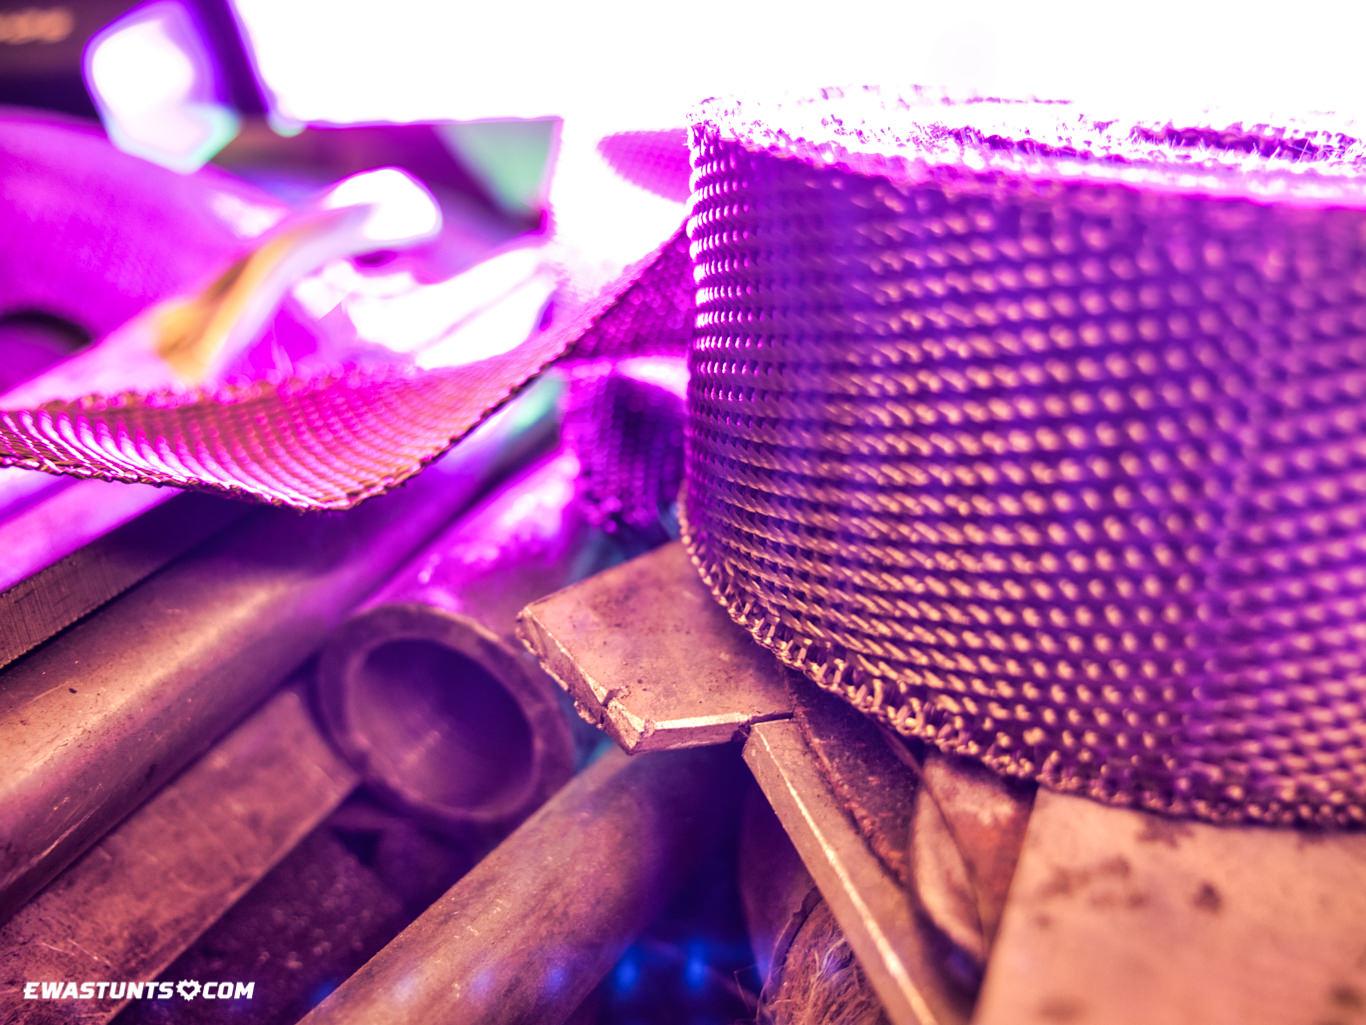 ewastunts_engine_wrapping_7